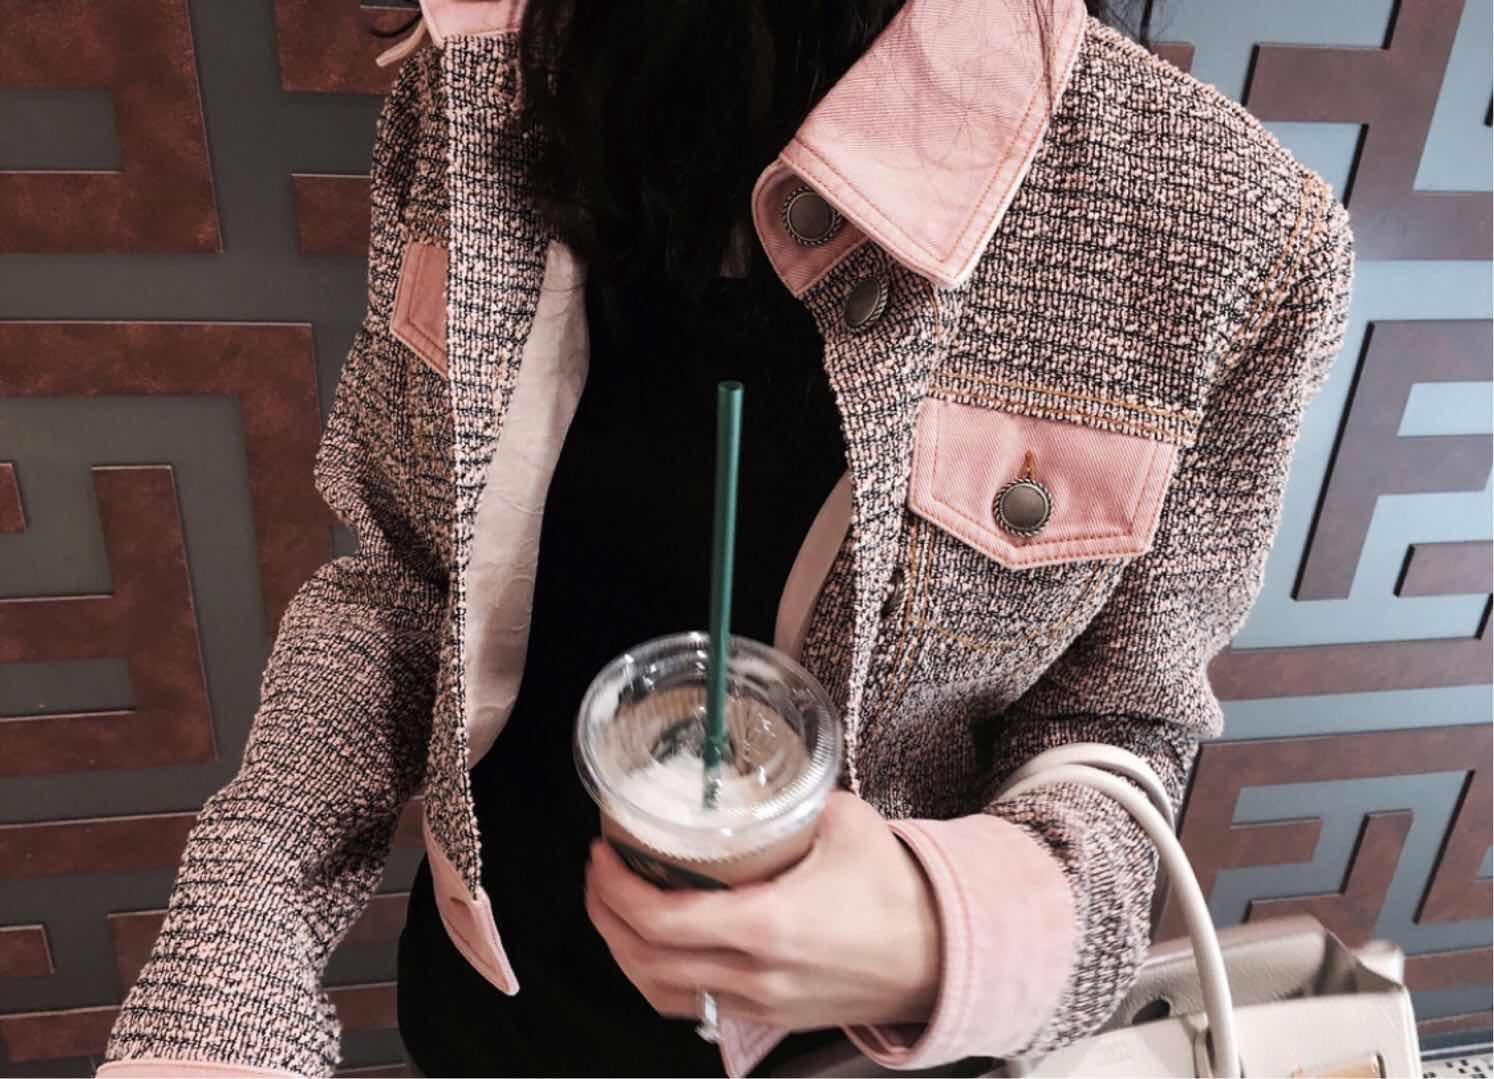 momoshero夹克短外套女2018秋季新款女装粉色棒球服休闲修身上衣